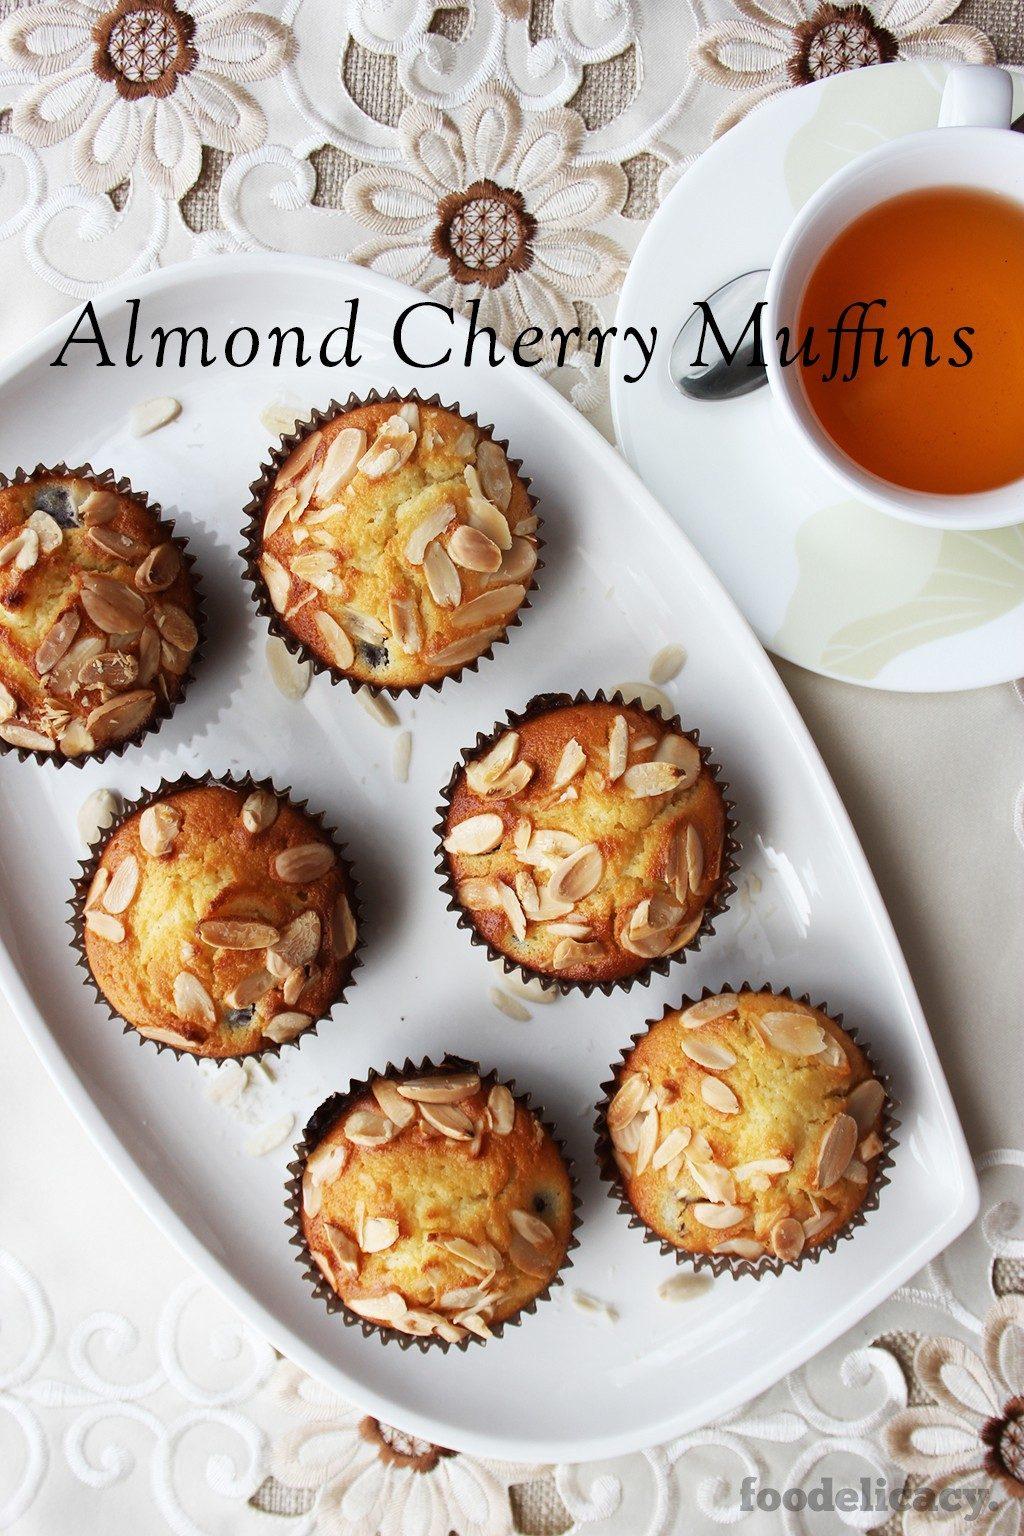 Almond_Cherry_Muffins_1C